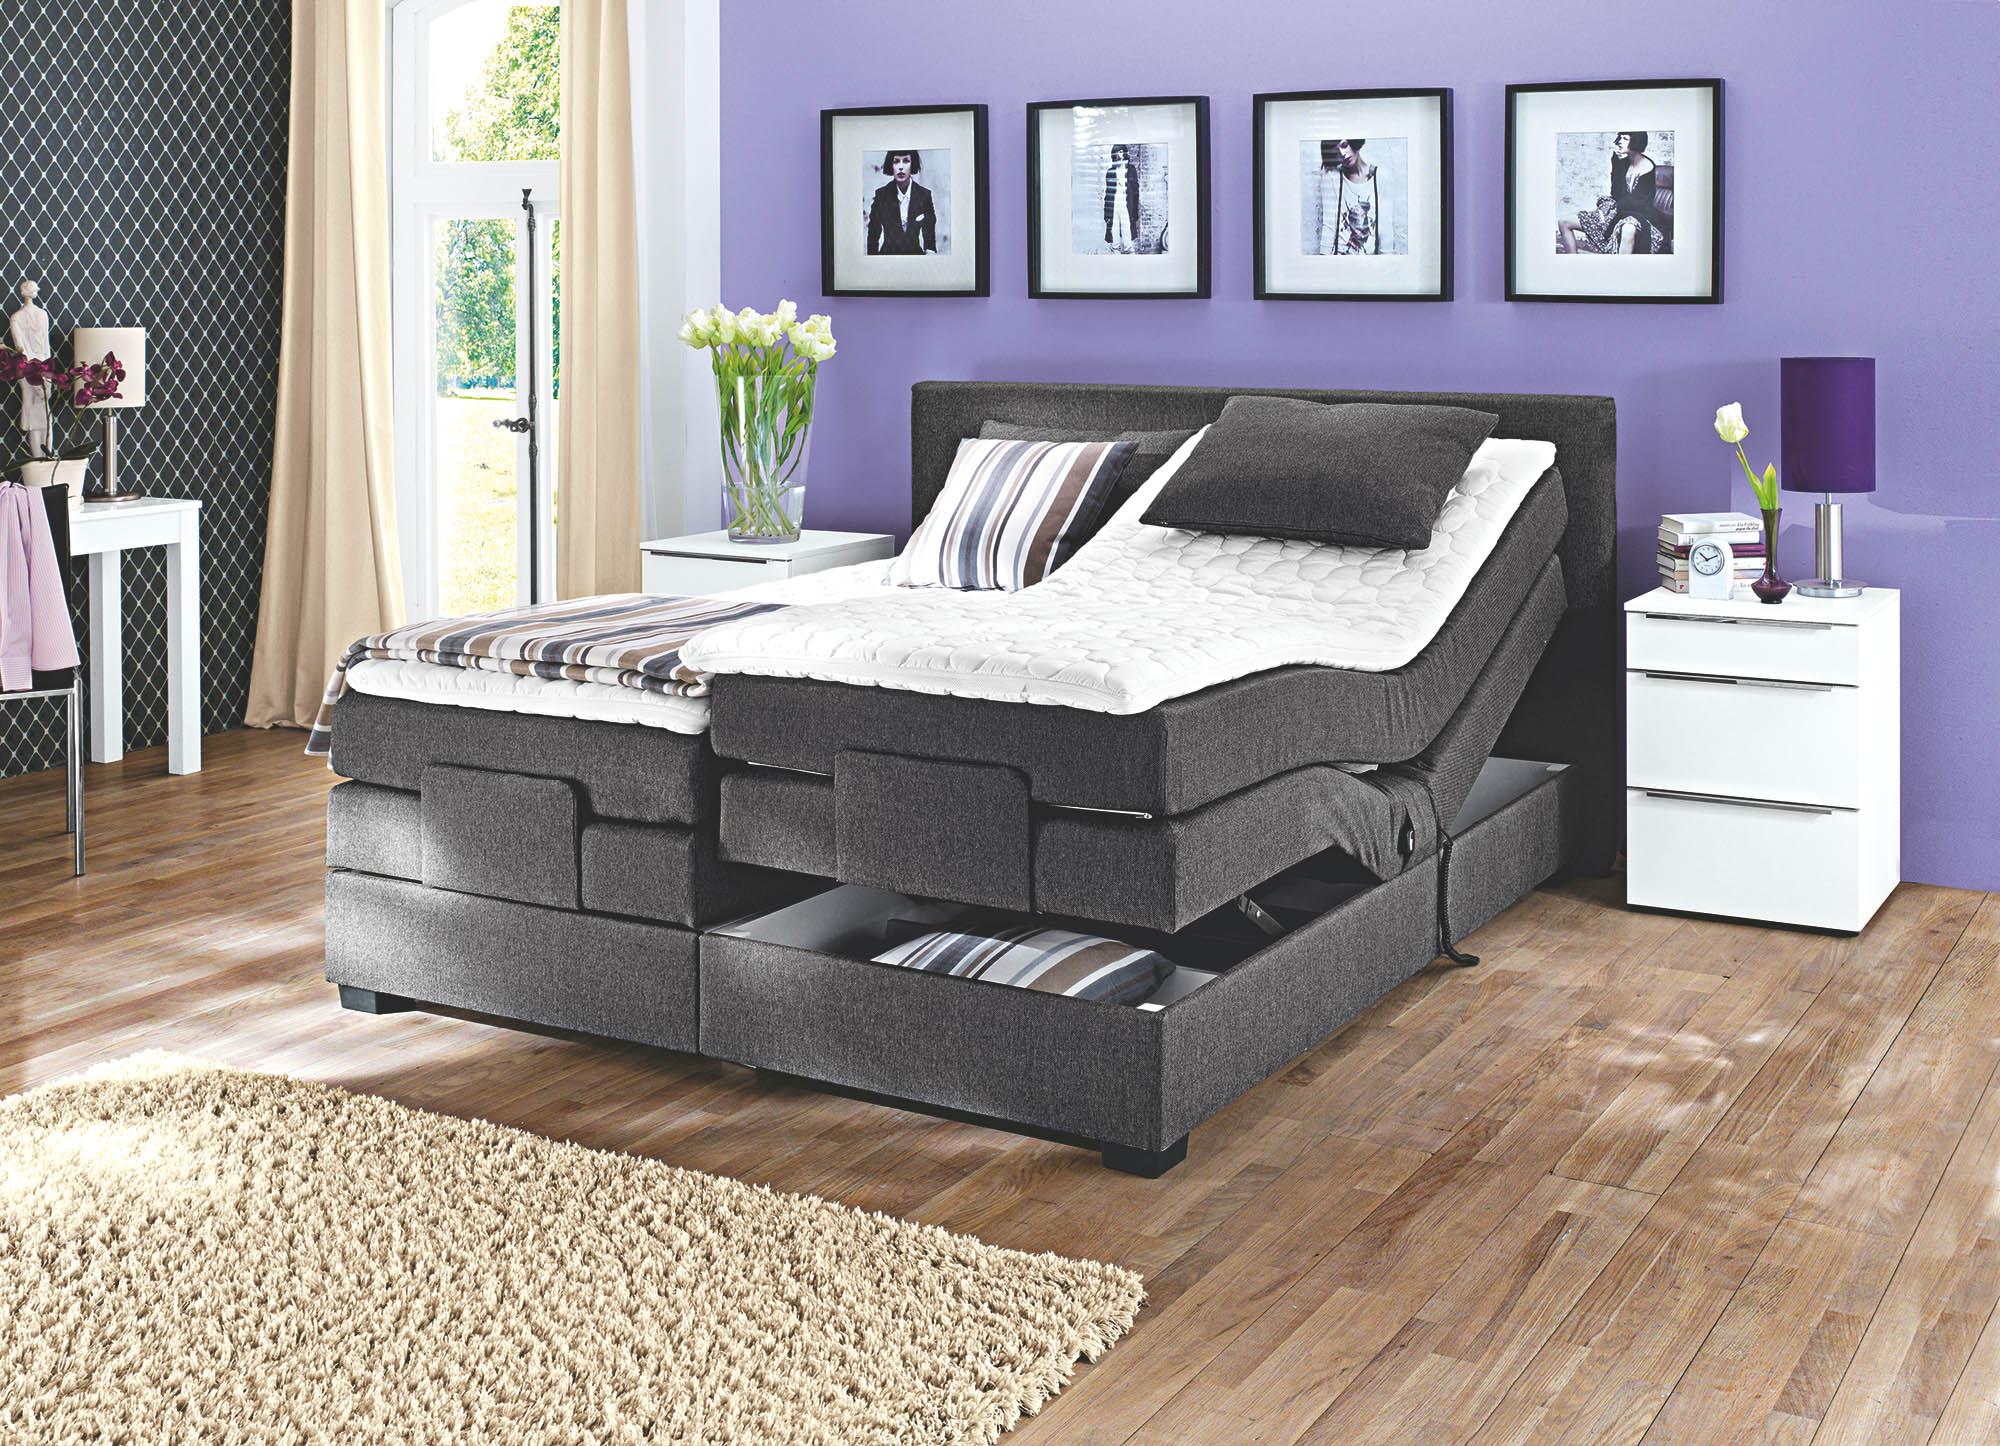 boxspringbett oschmann belcanto filou motor 200x200 m bel. Black Bedroom Furniture Sets. Home Design Ideas